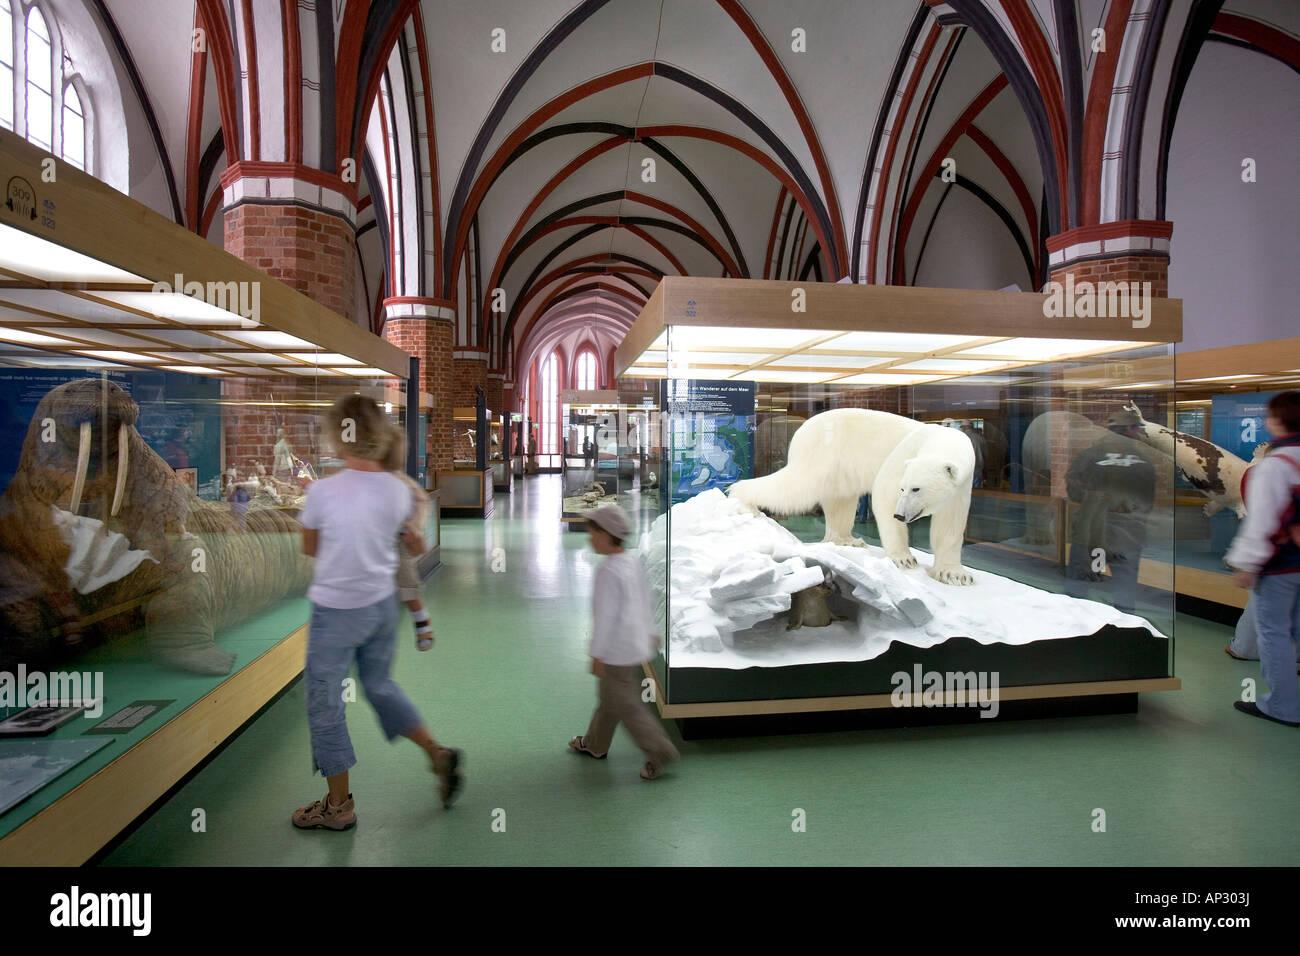 Oceanic Museum, Katharinen Cloister, Stralsund, Baltic Sea, Mecklenburg-Western Pomerania, Germany - Stock Image